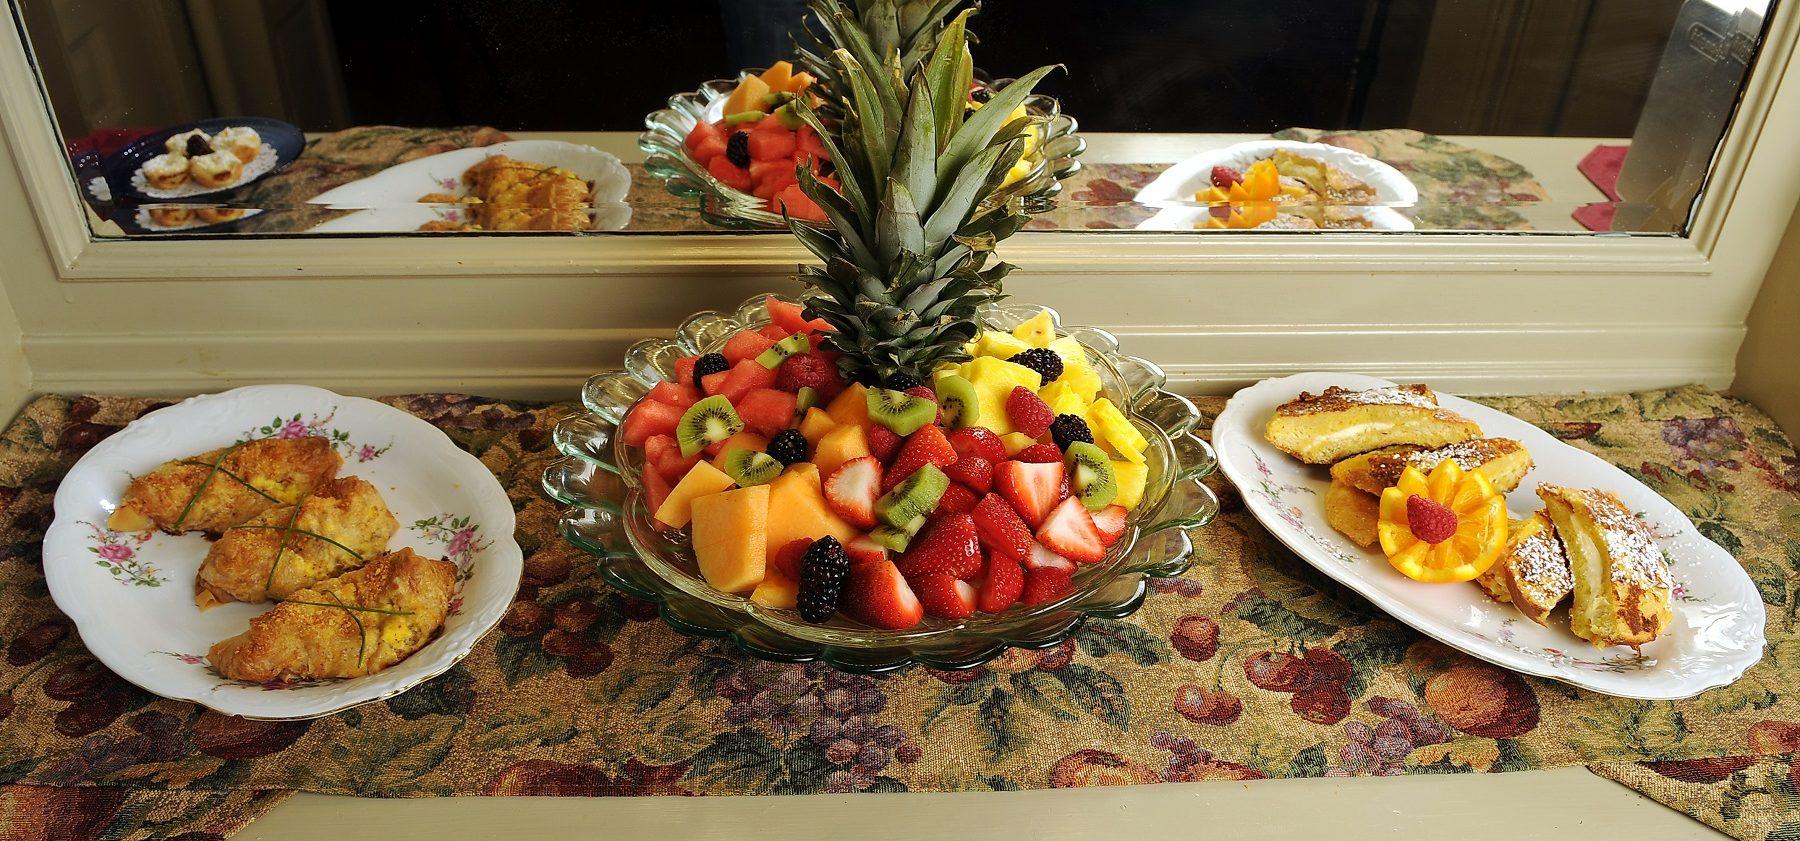 Oliver Inn - Food Buffet